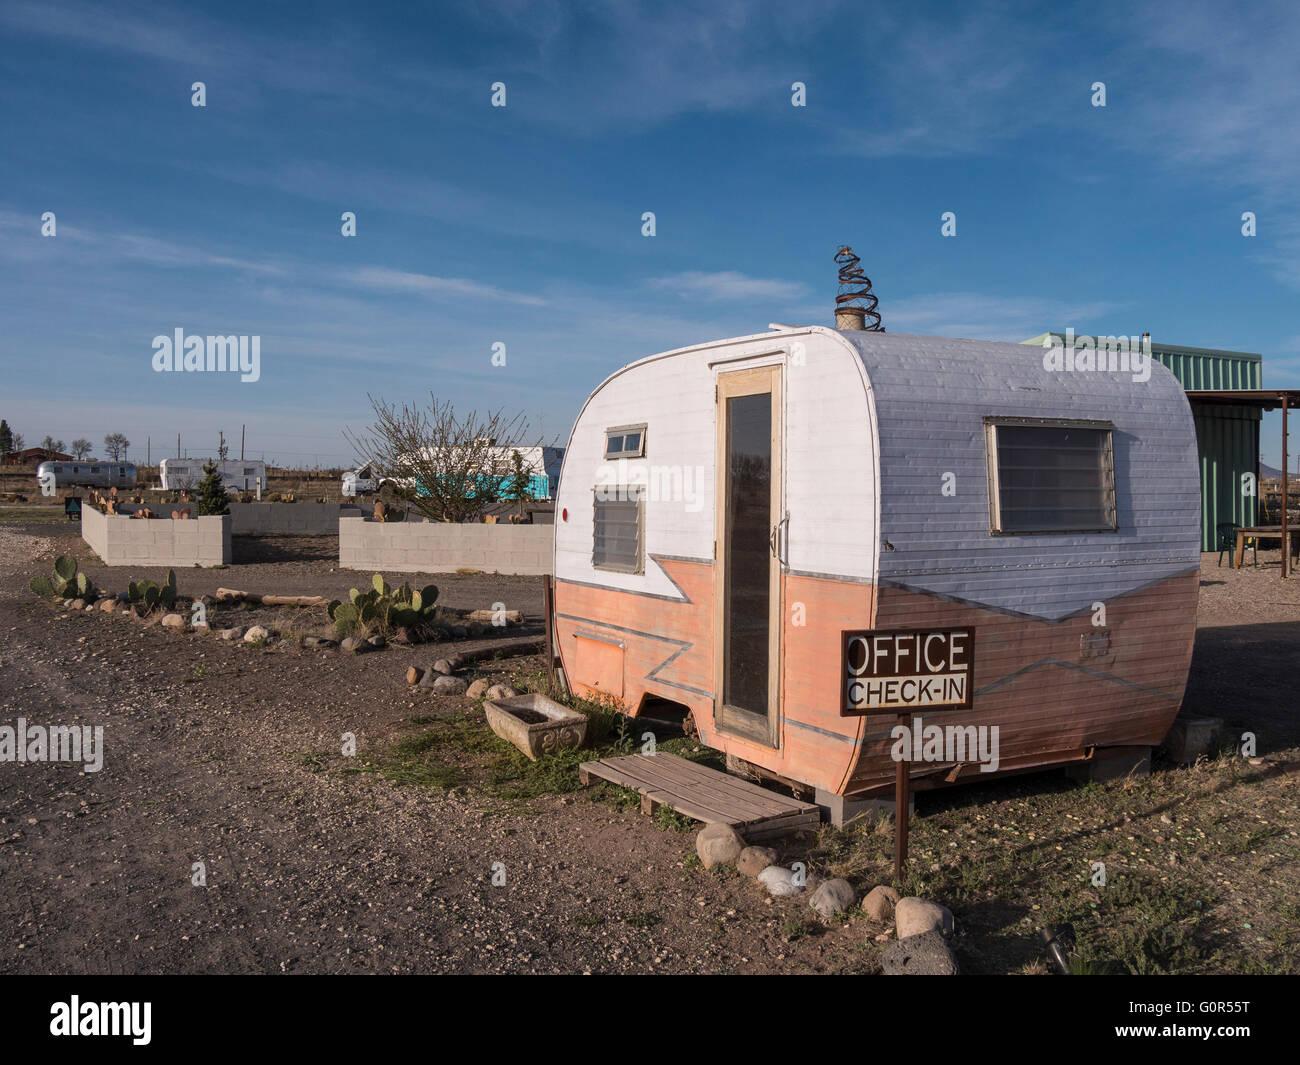 Office, Tumble In RV Park, Marfa, Texas. - Stock Image